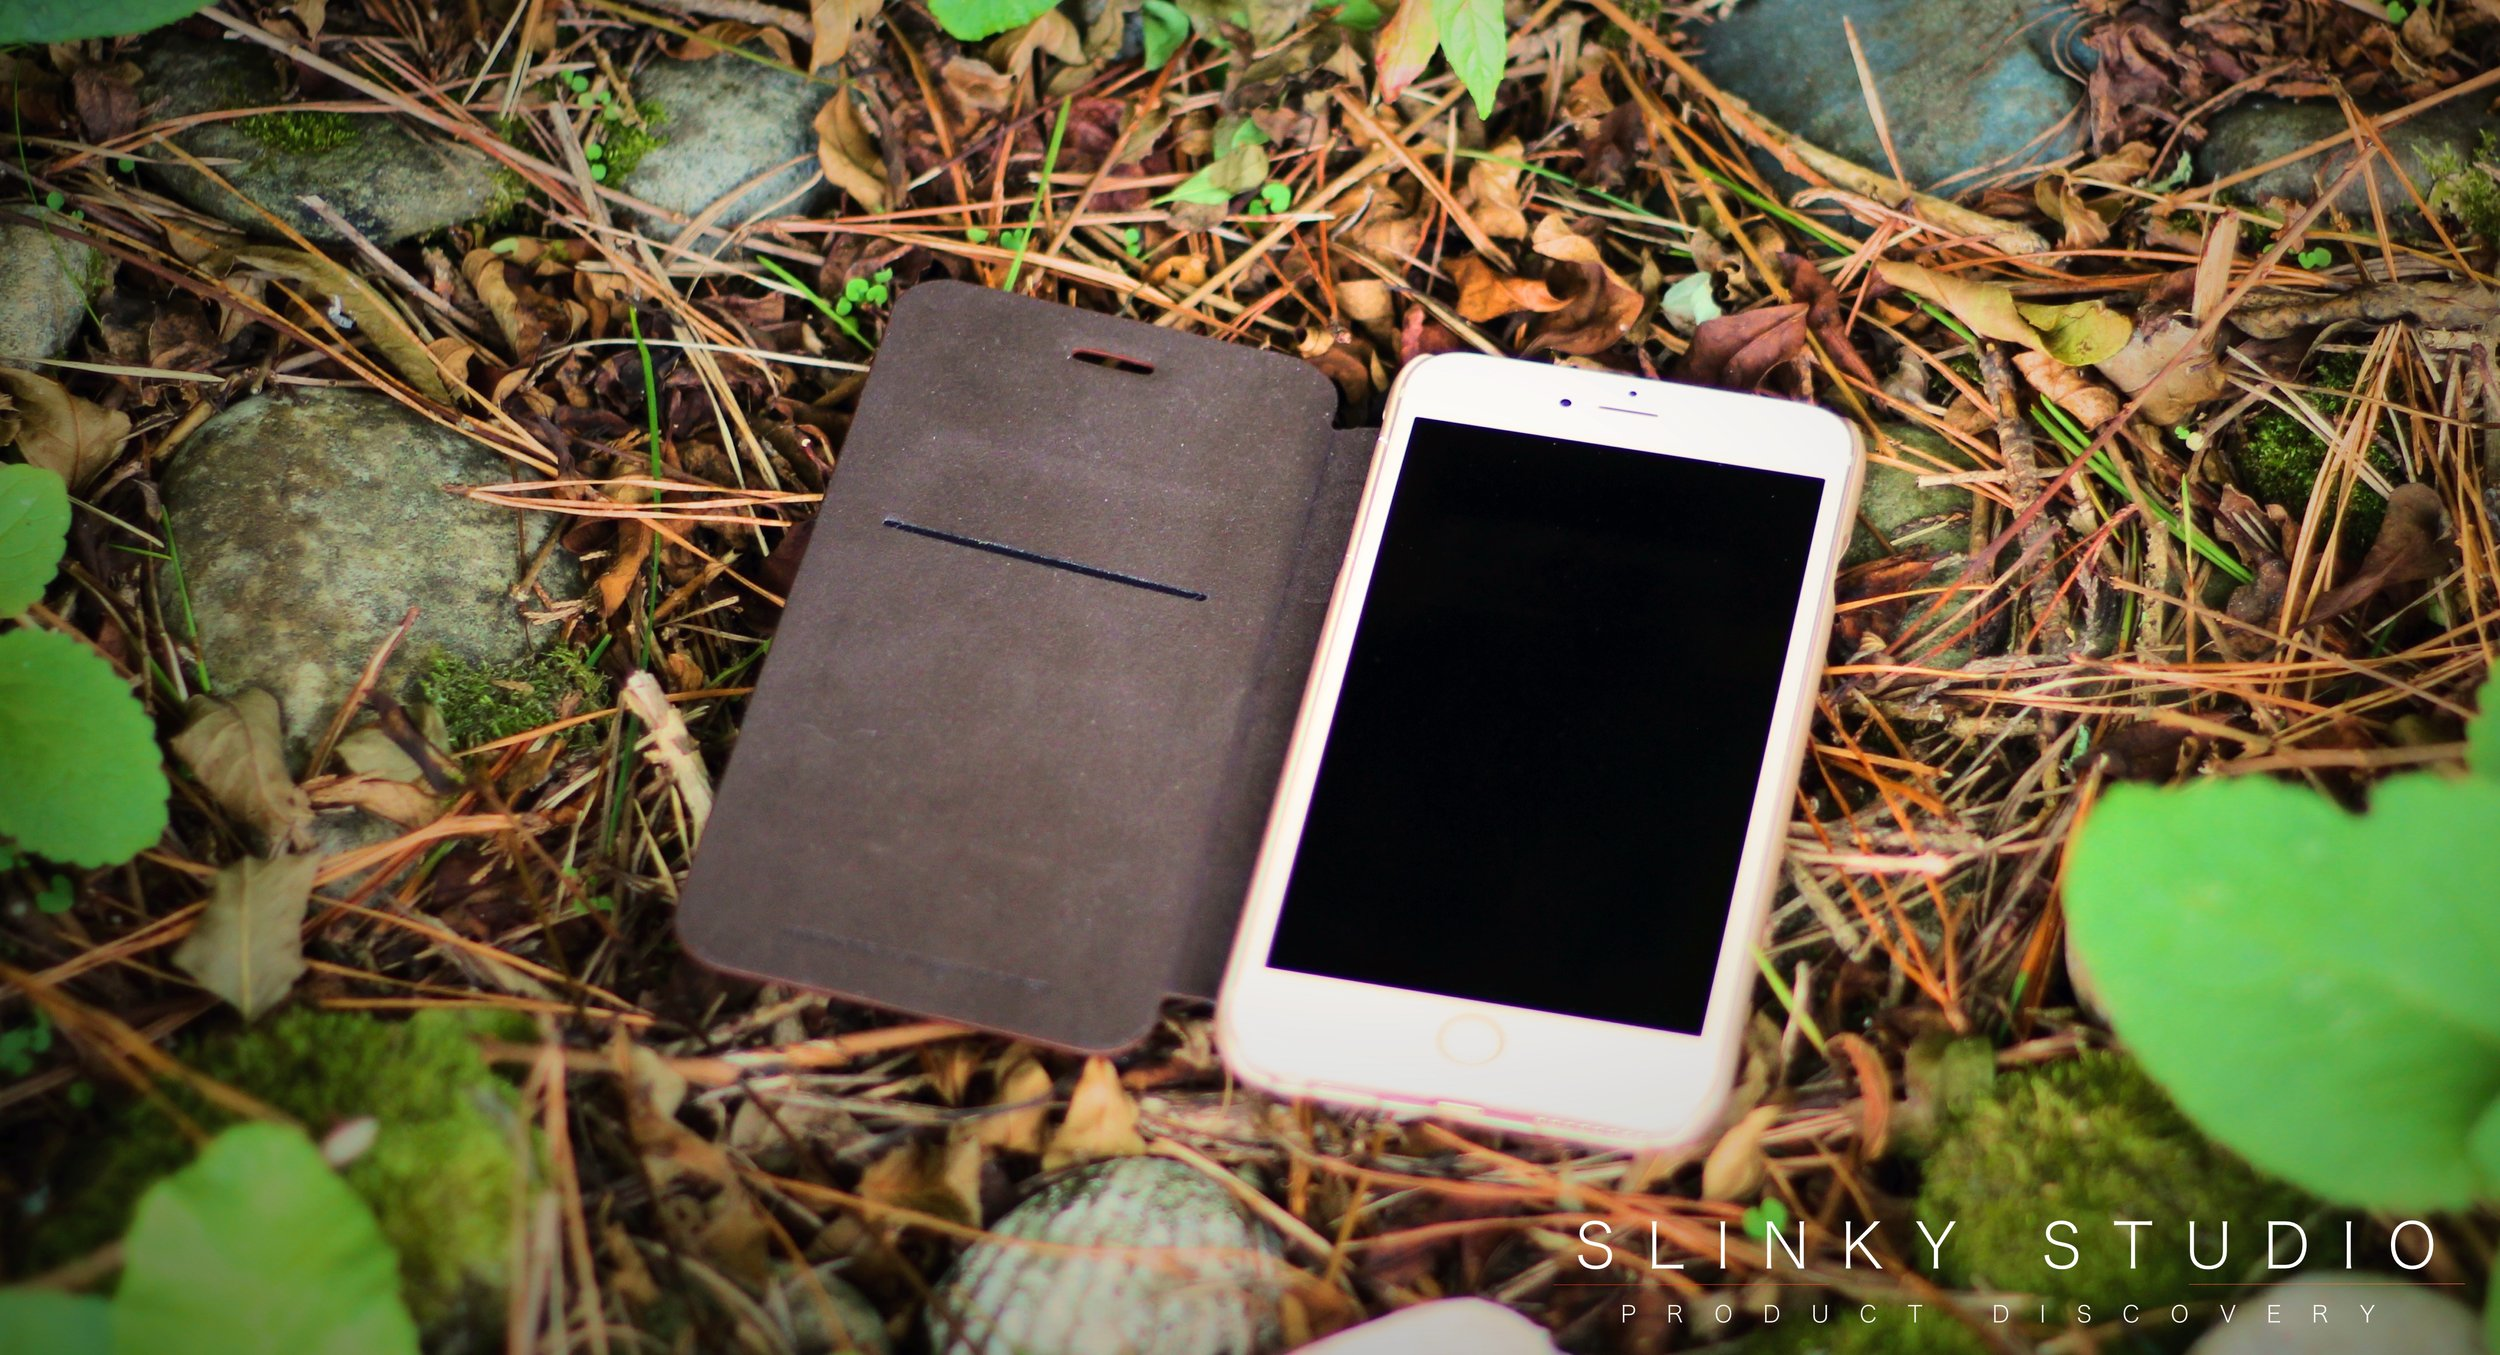 Elago Leather Flip Case for iPhone 6:6s Plus Open Lying on Fallen Pine Needles.jpg